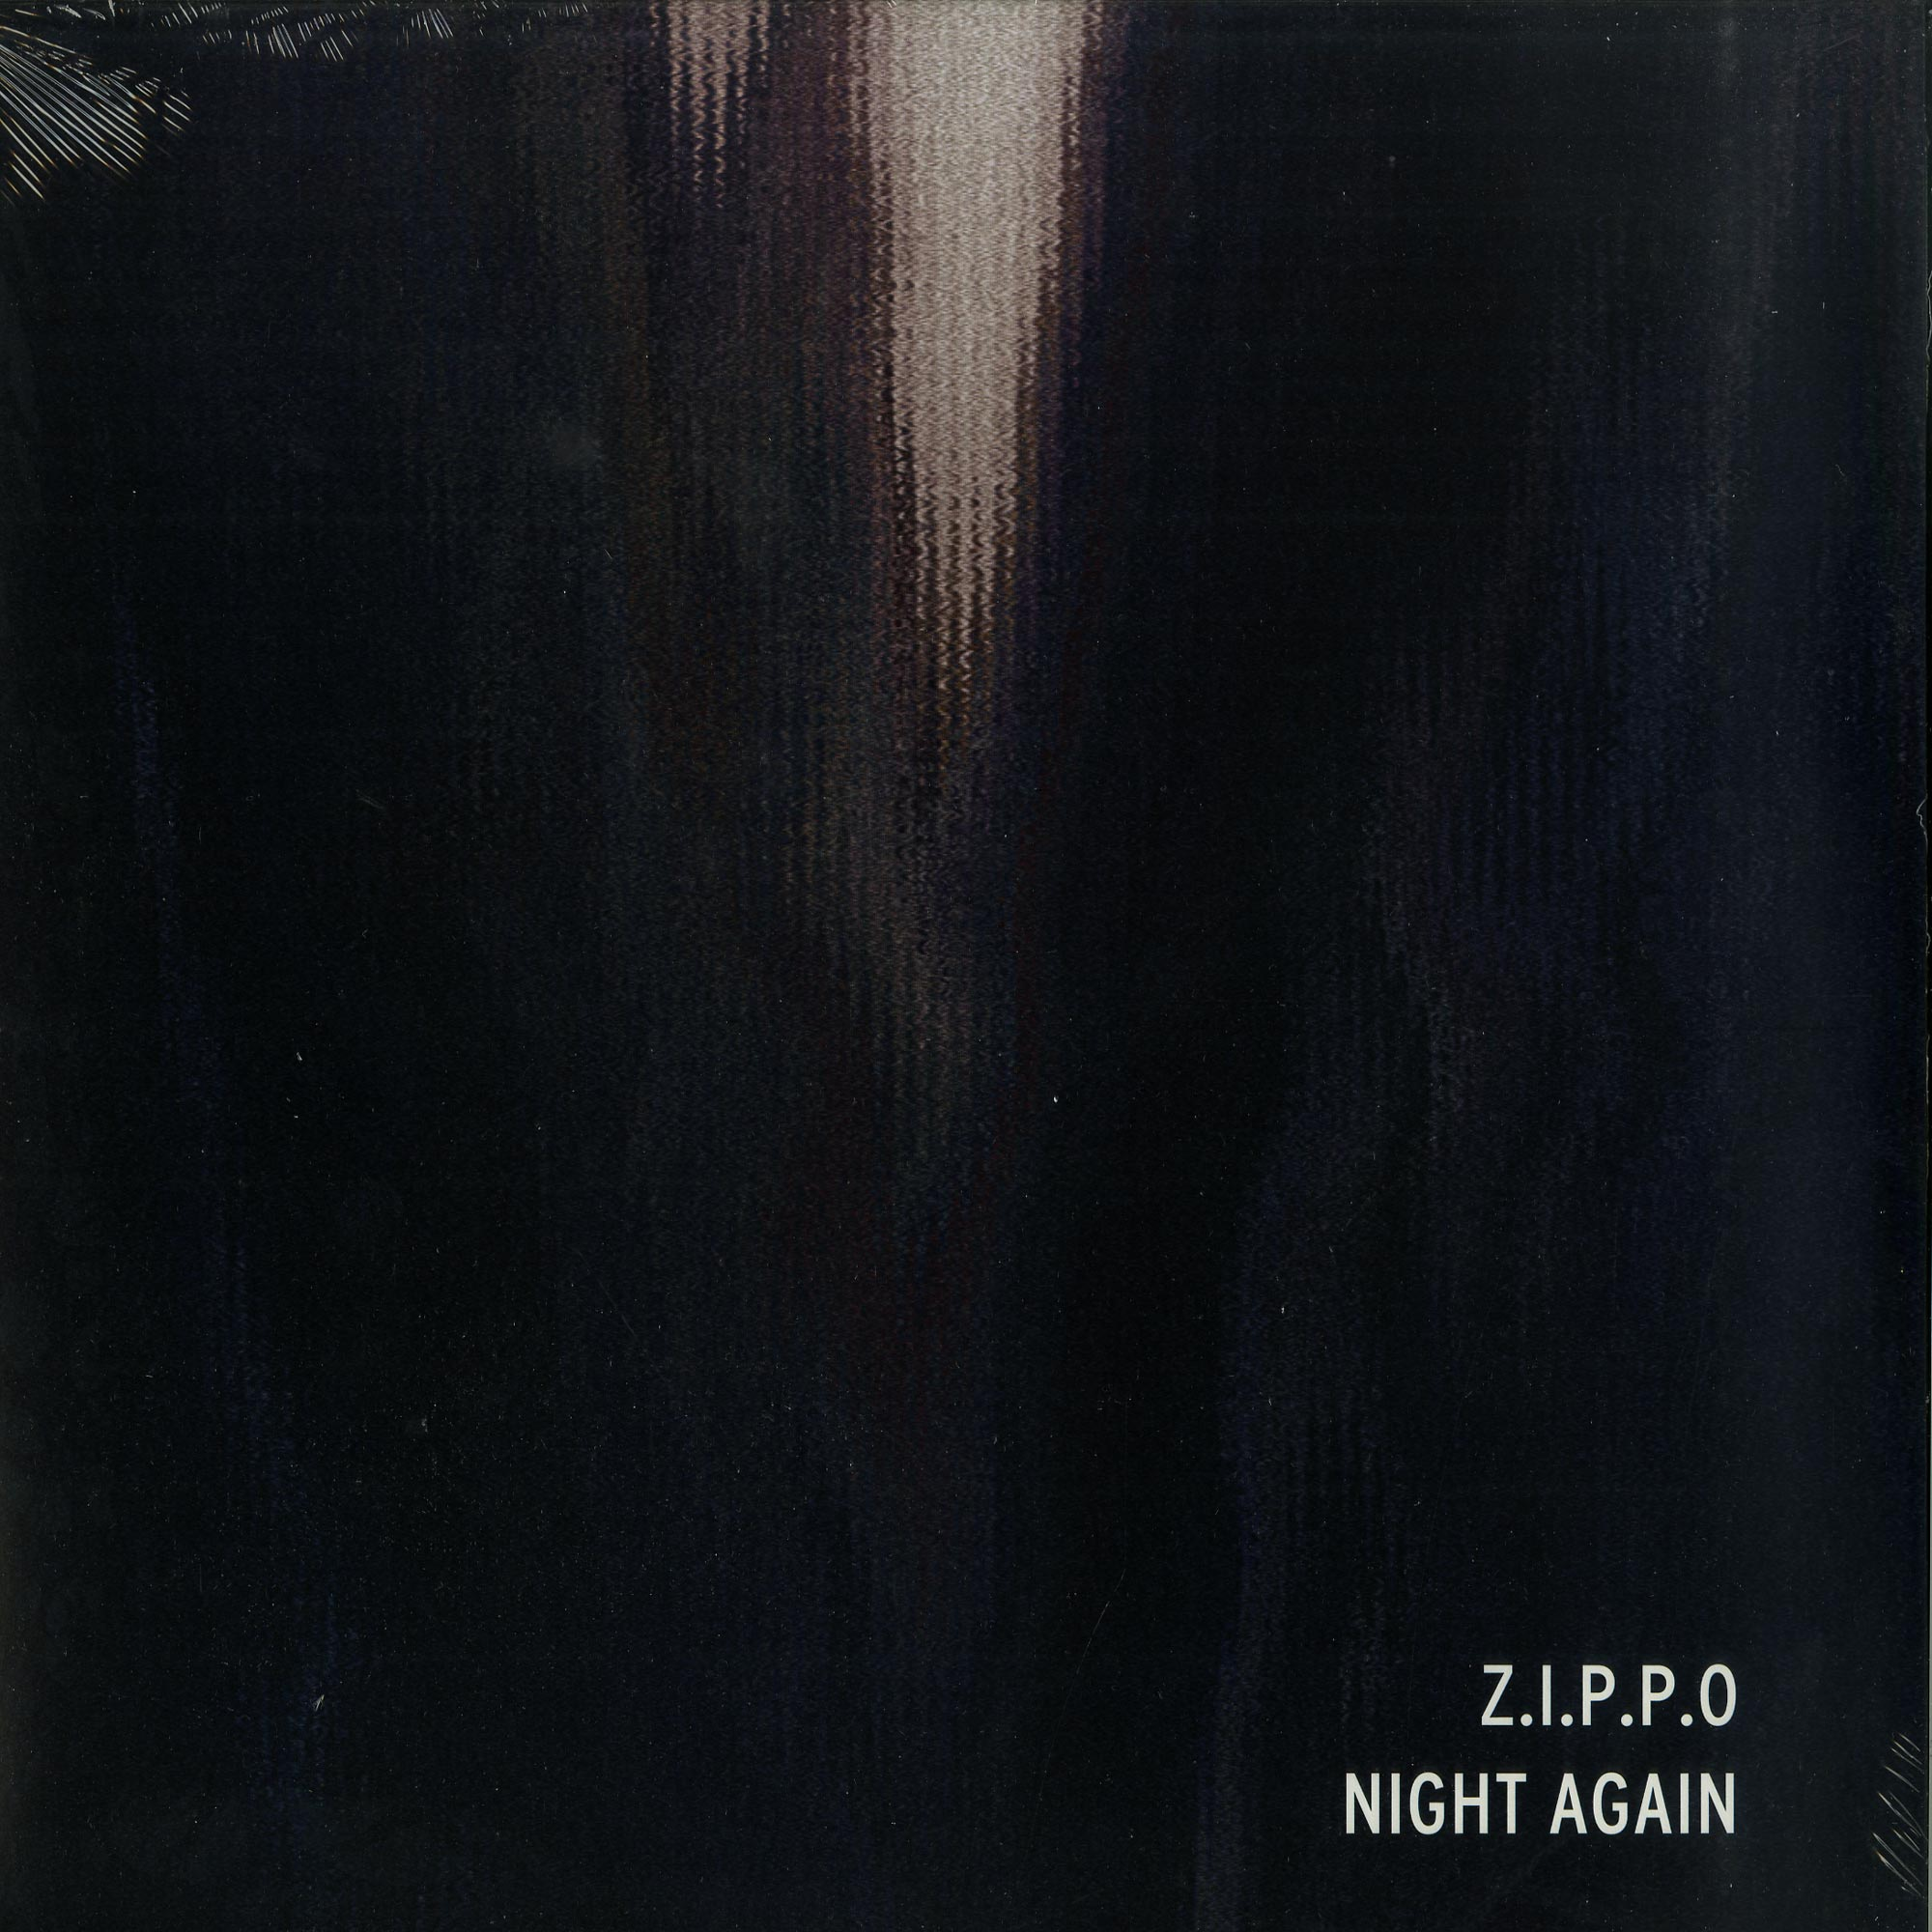 Z.I.P.P.O - NIGHT AGAIN